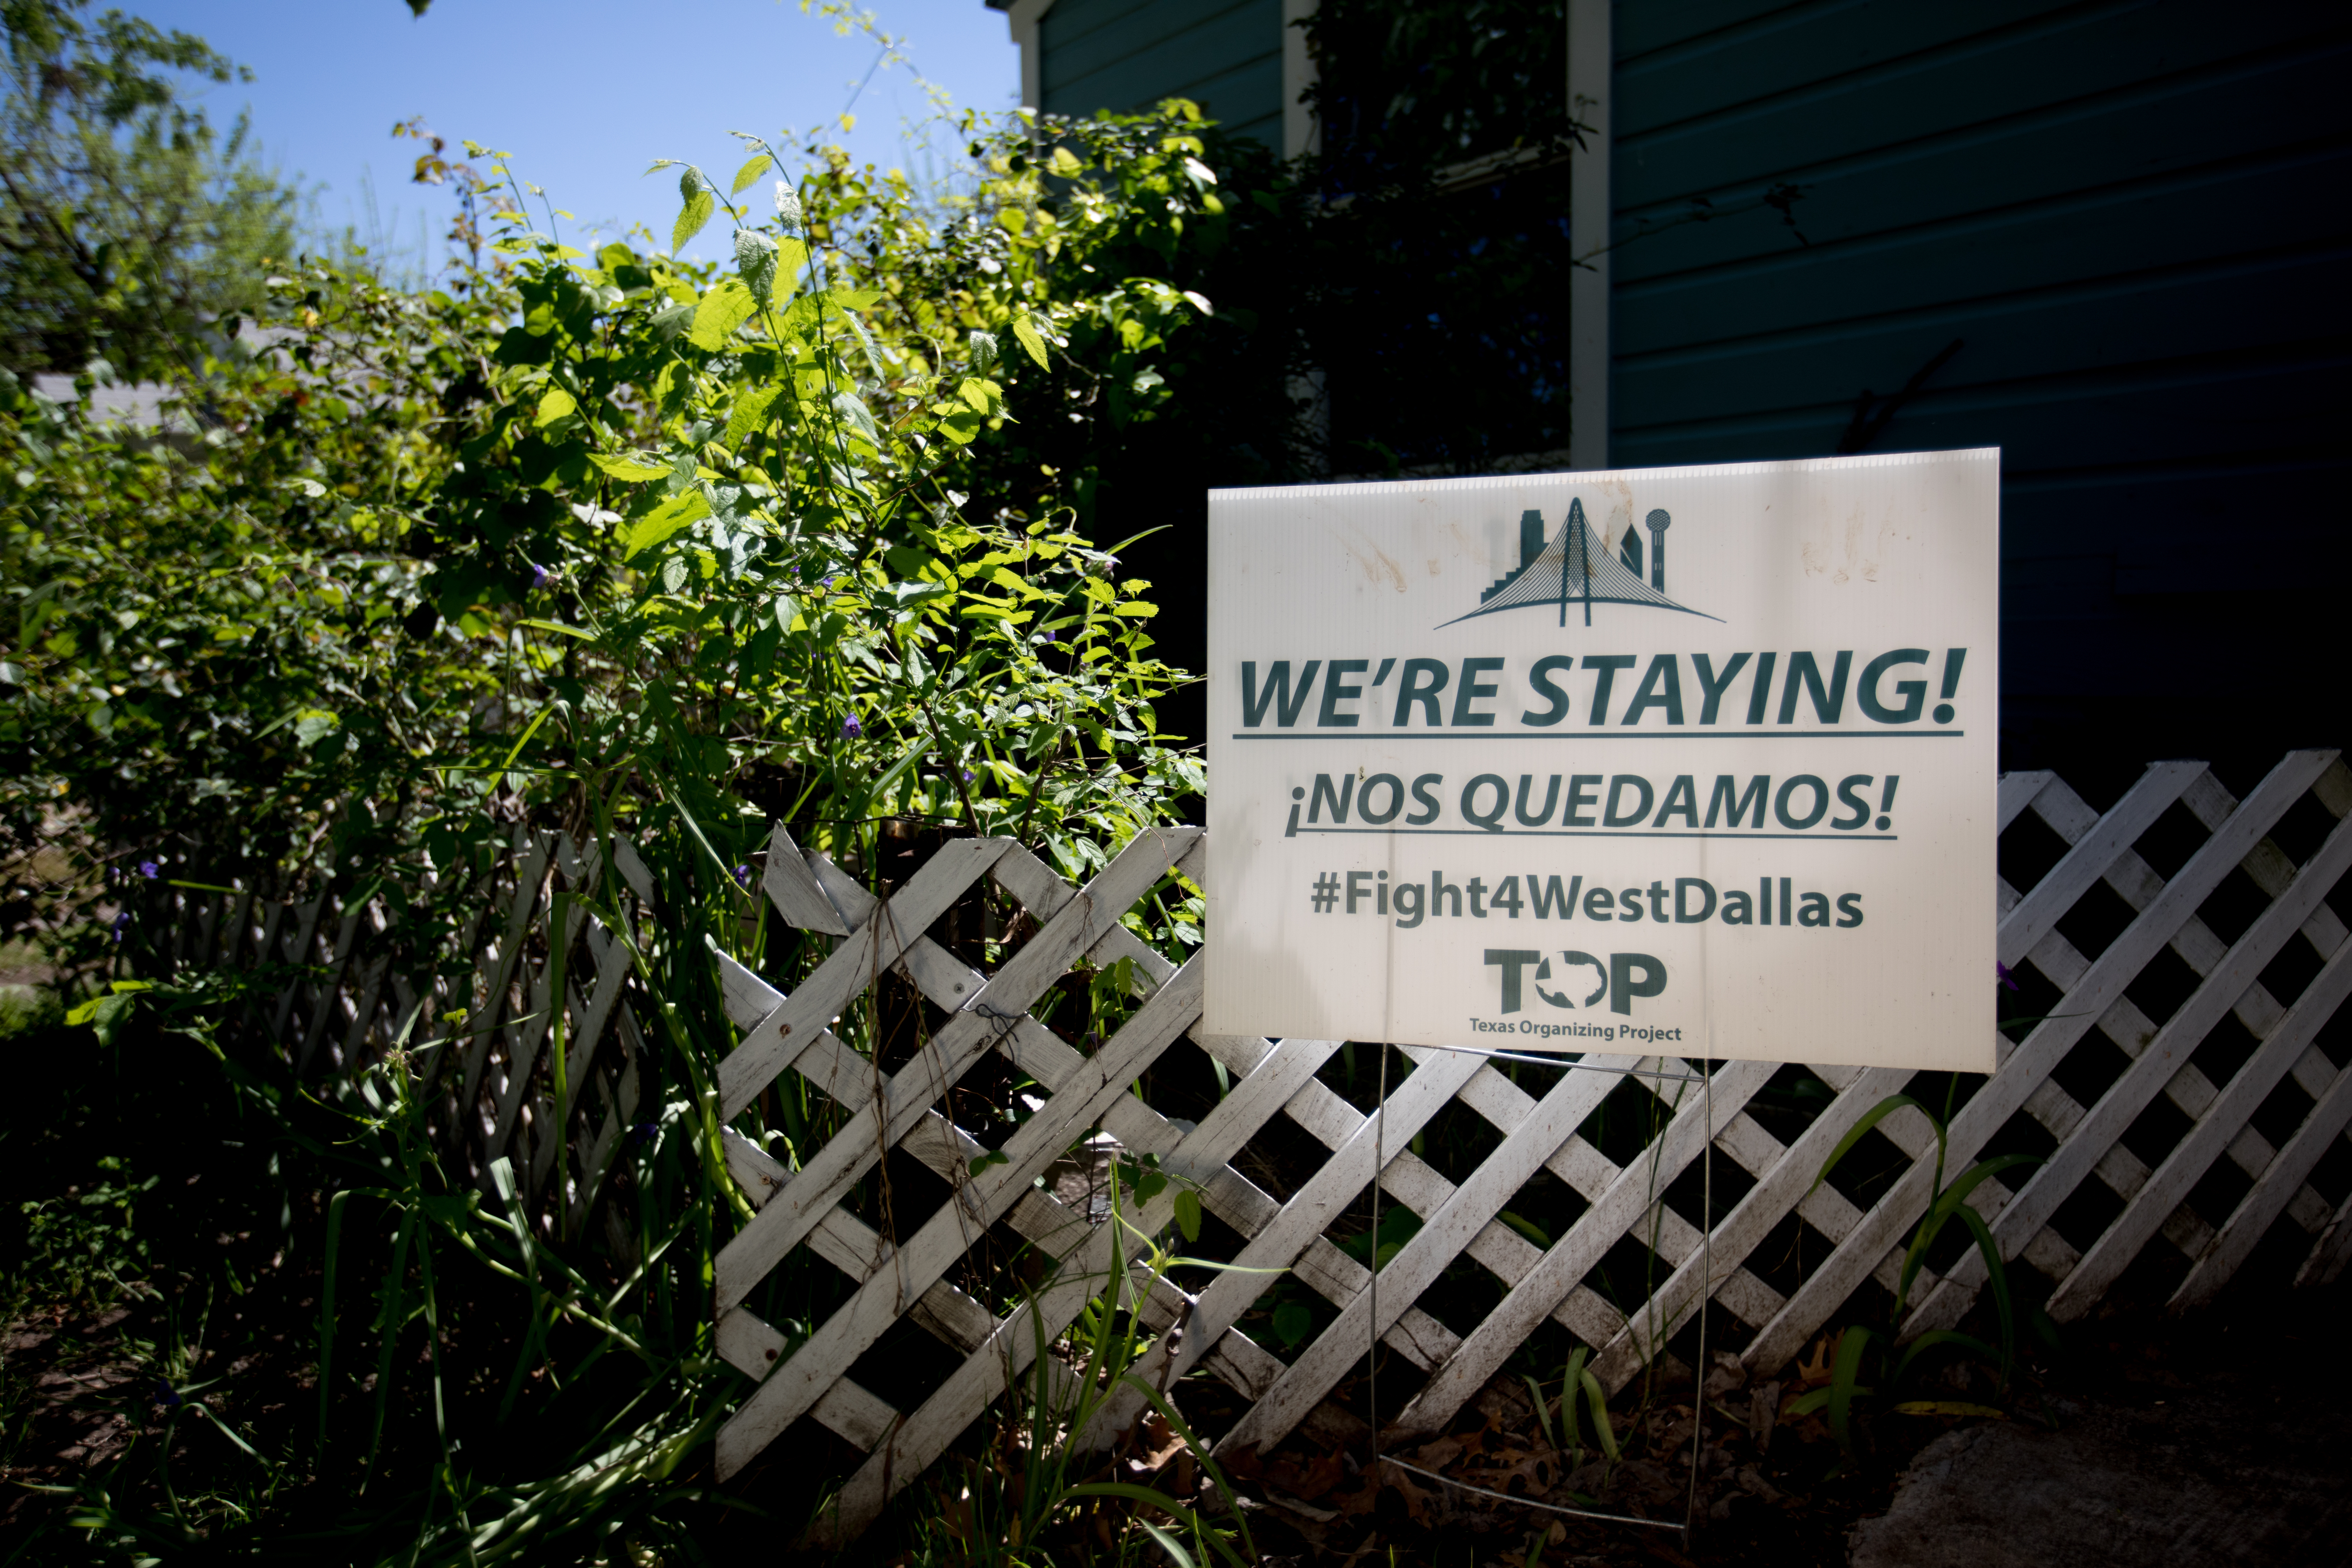 A sign in Joe Garcia's yard on McBroom in west Dallas. Photo/Allison V. Smith